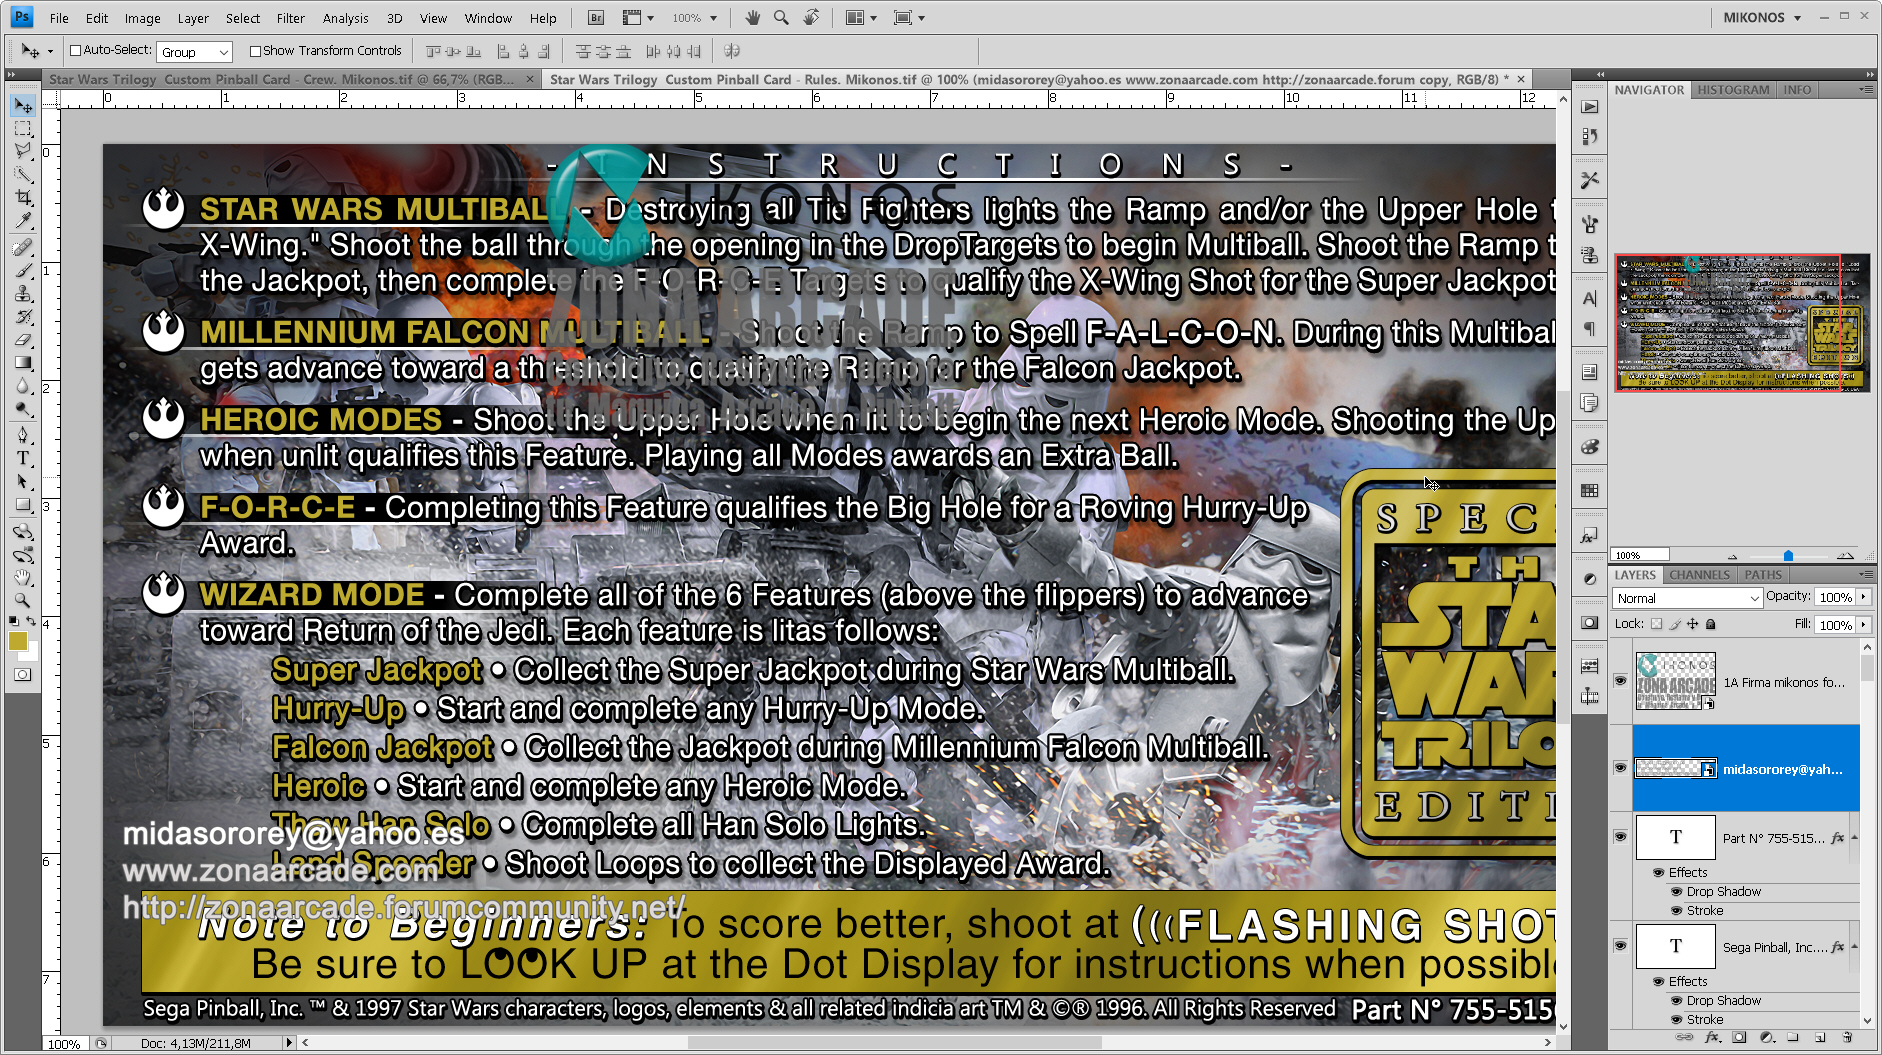 Star Wars Trilogy Pinball Card Customized - Rules. Mikonos2